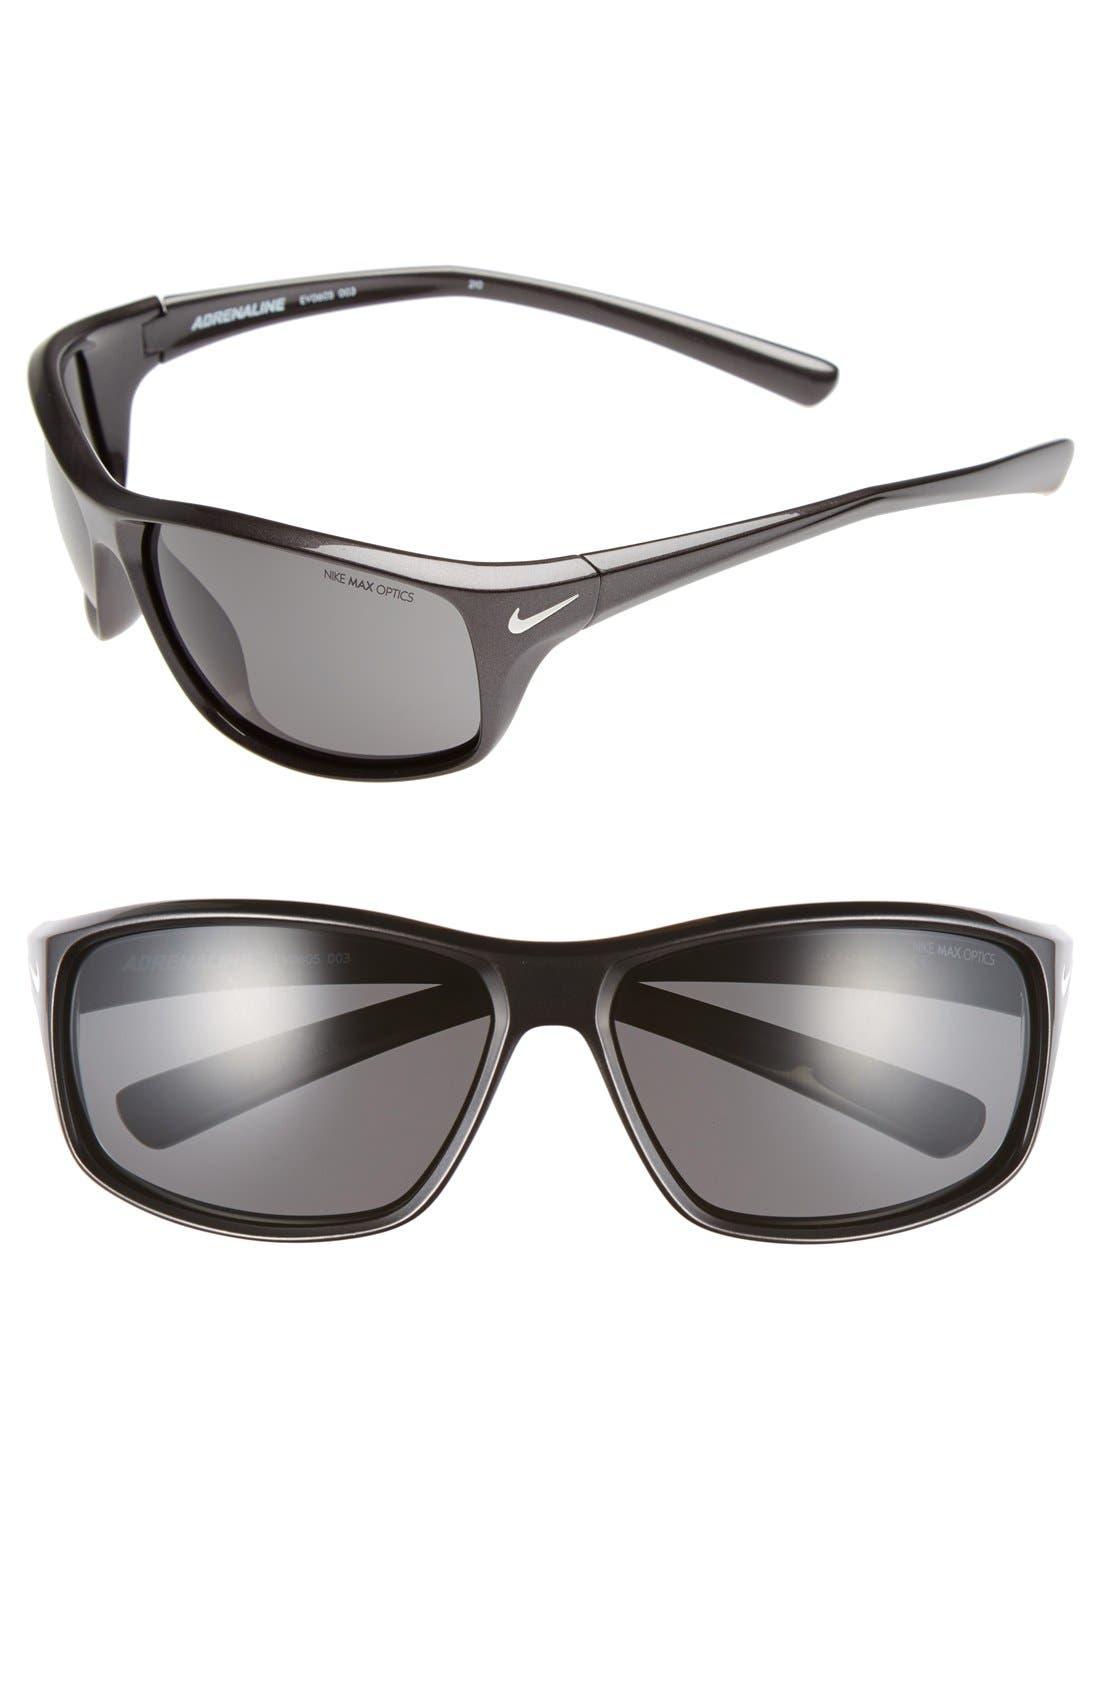 Main Image - Nike 'Adrenaline' 64mm Sunglasses